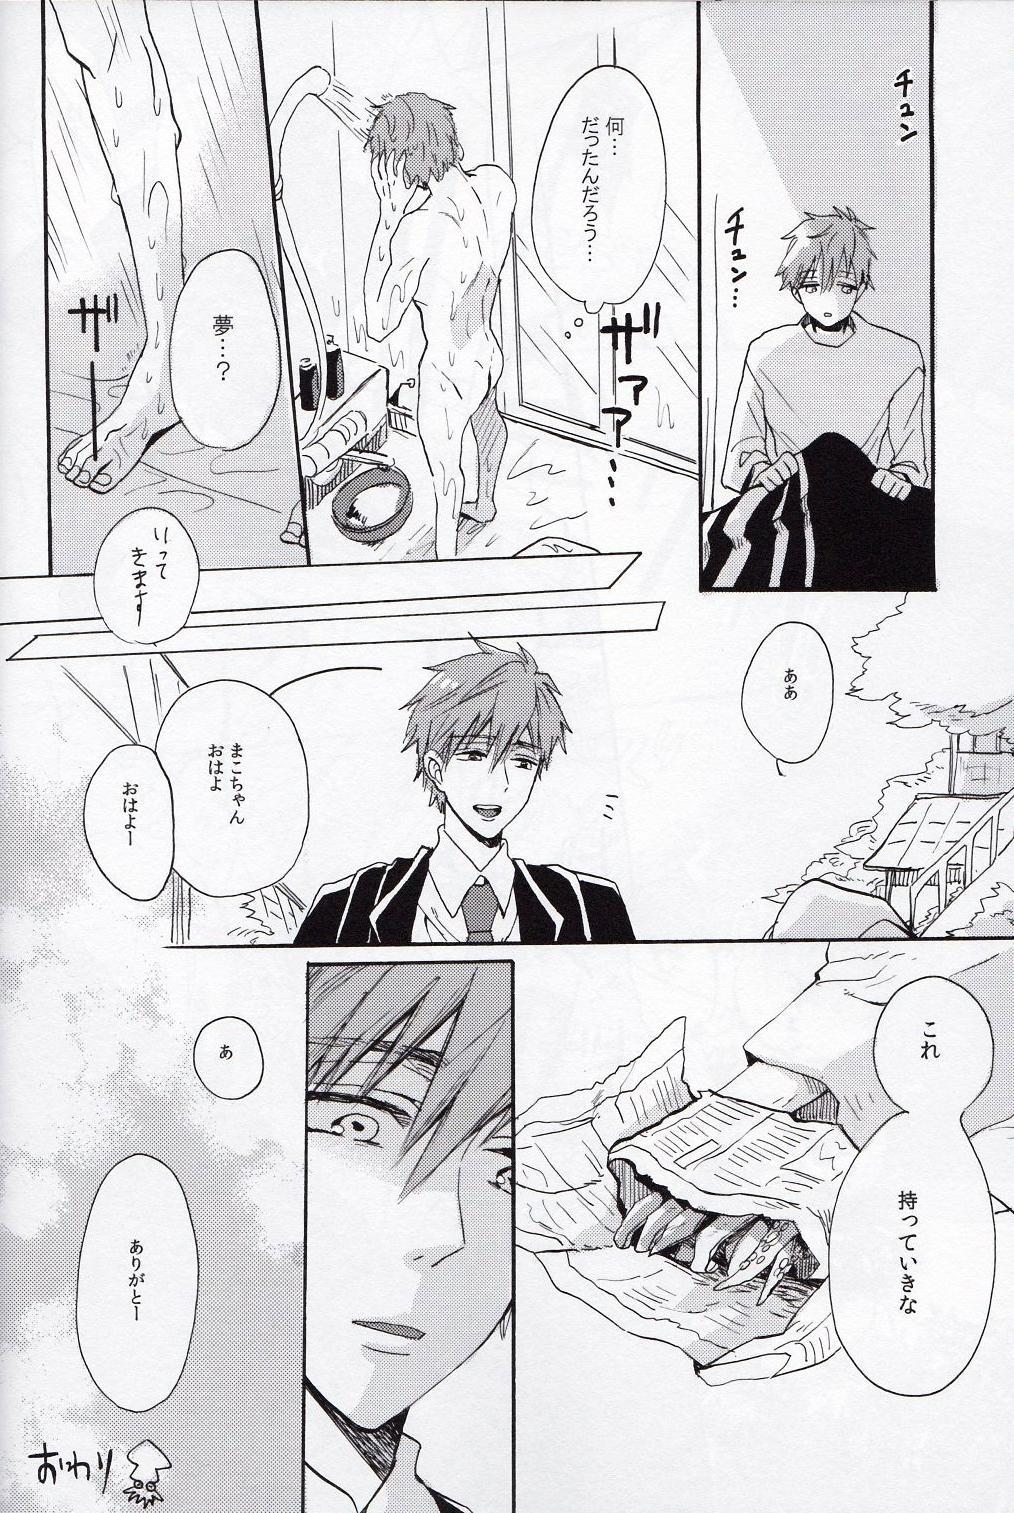 [hn (pirori)] Mako-chan jana-Ika!? (Free!) 16